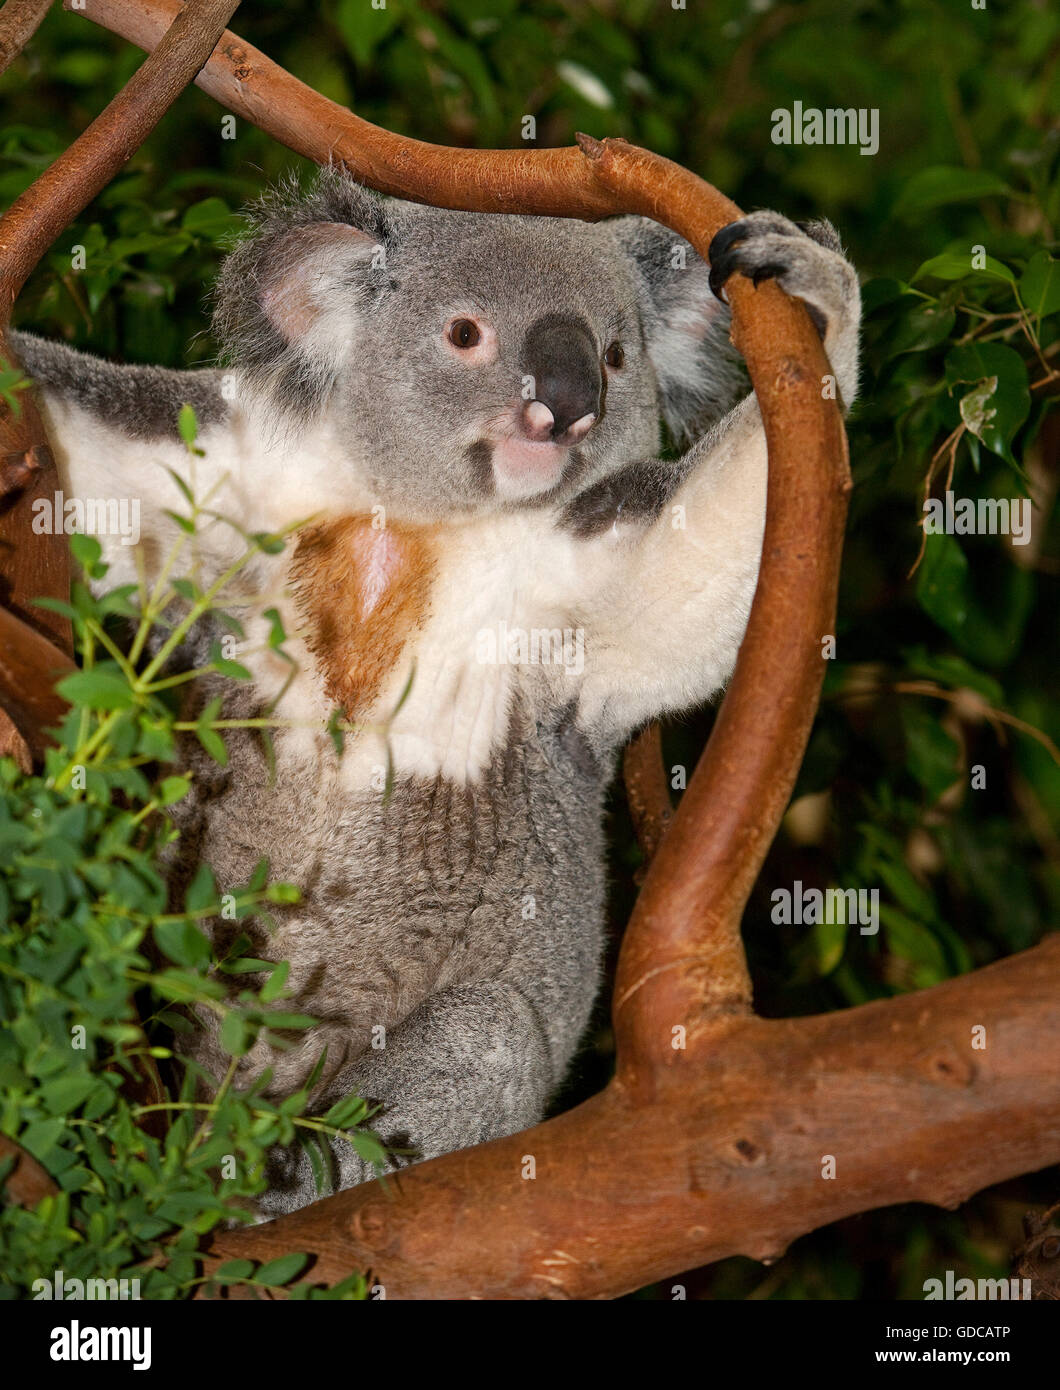 Koala, phascolarctos cinereus, Male sitting on Branch - Stock Image